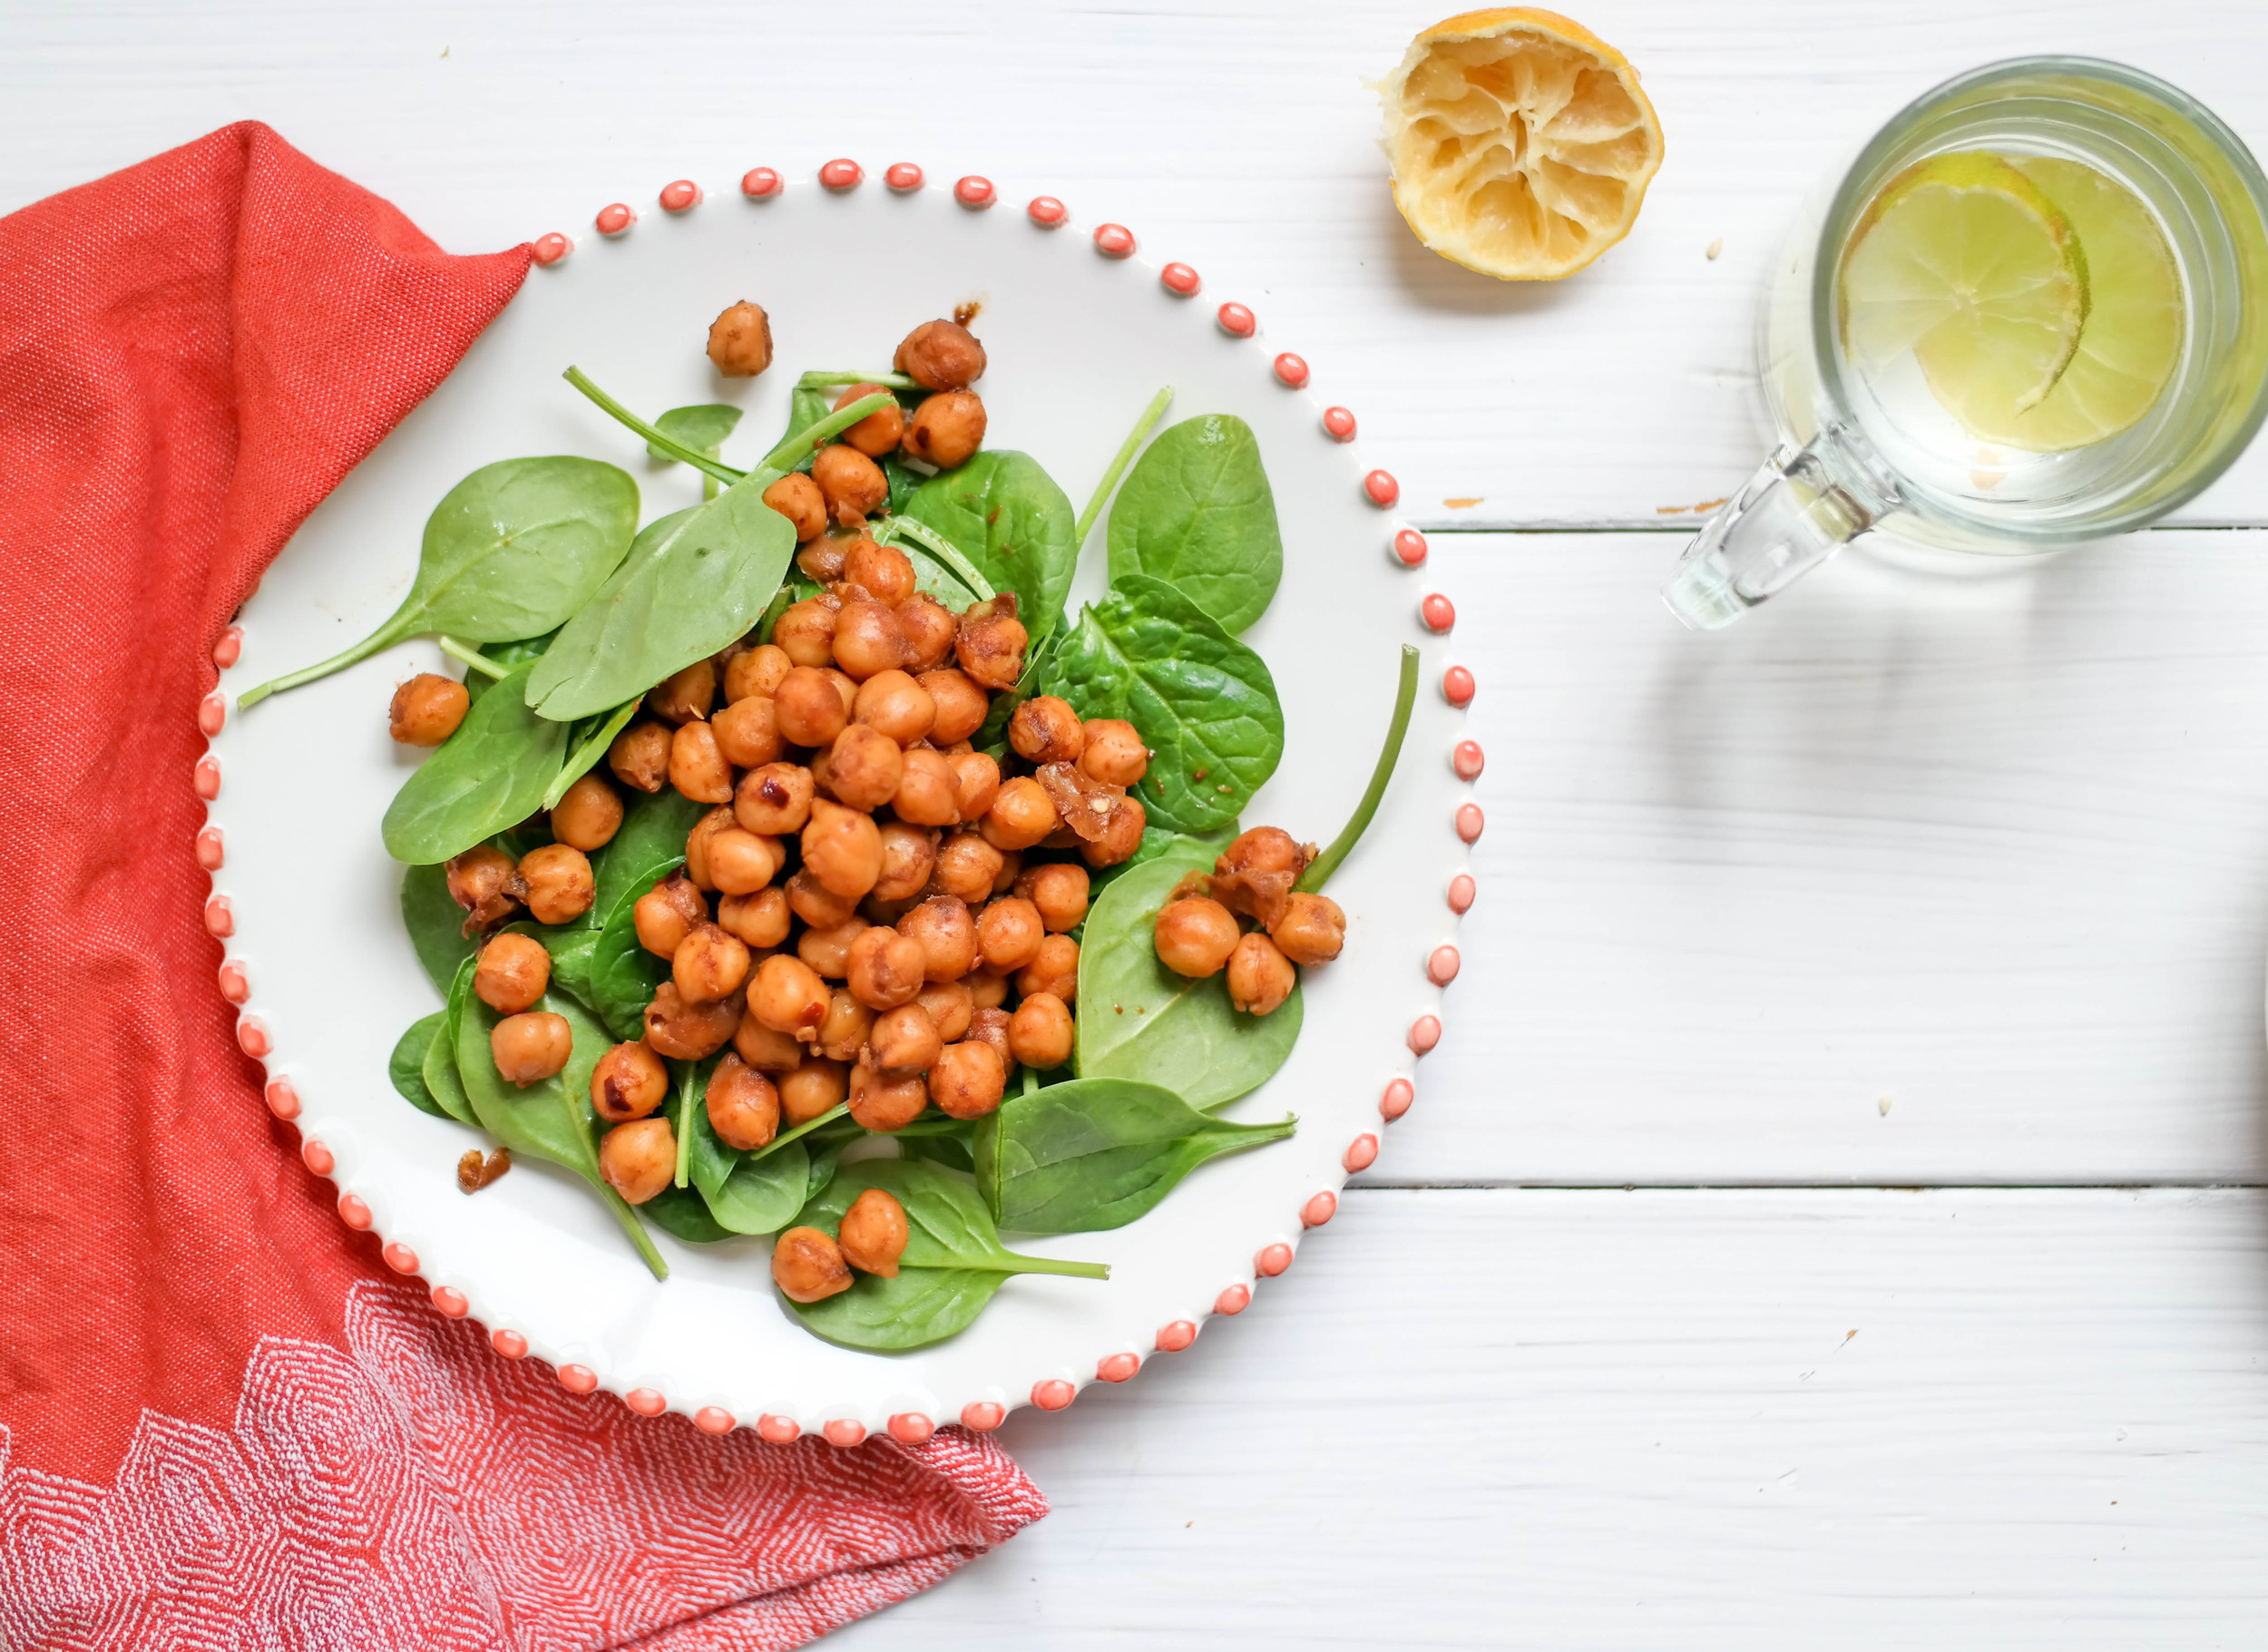 3-Chili-Infused-Chickpea-Salad | www.8thandlake.com